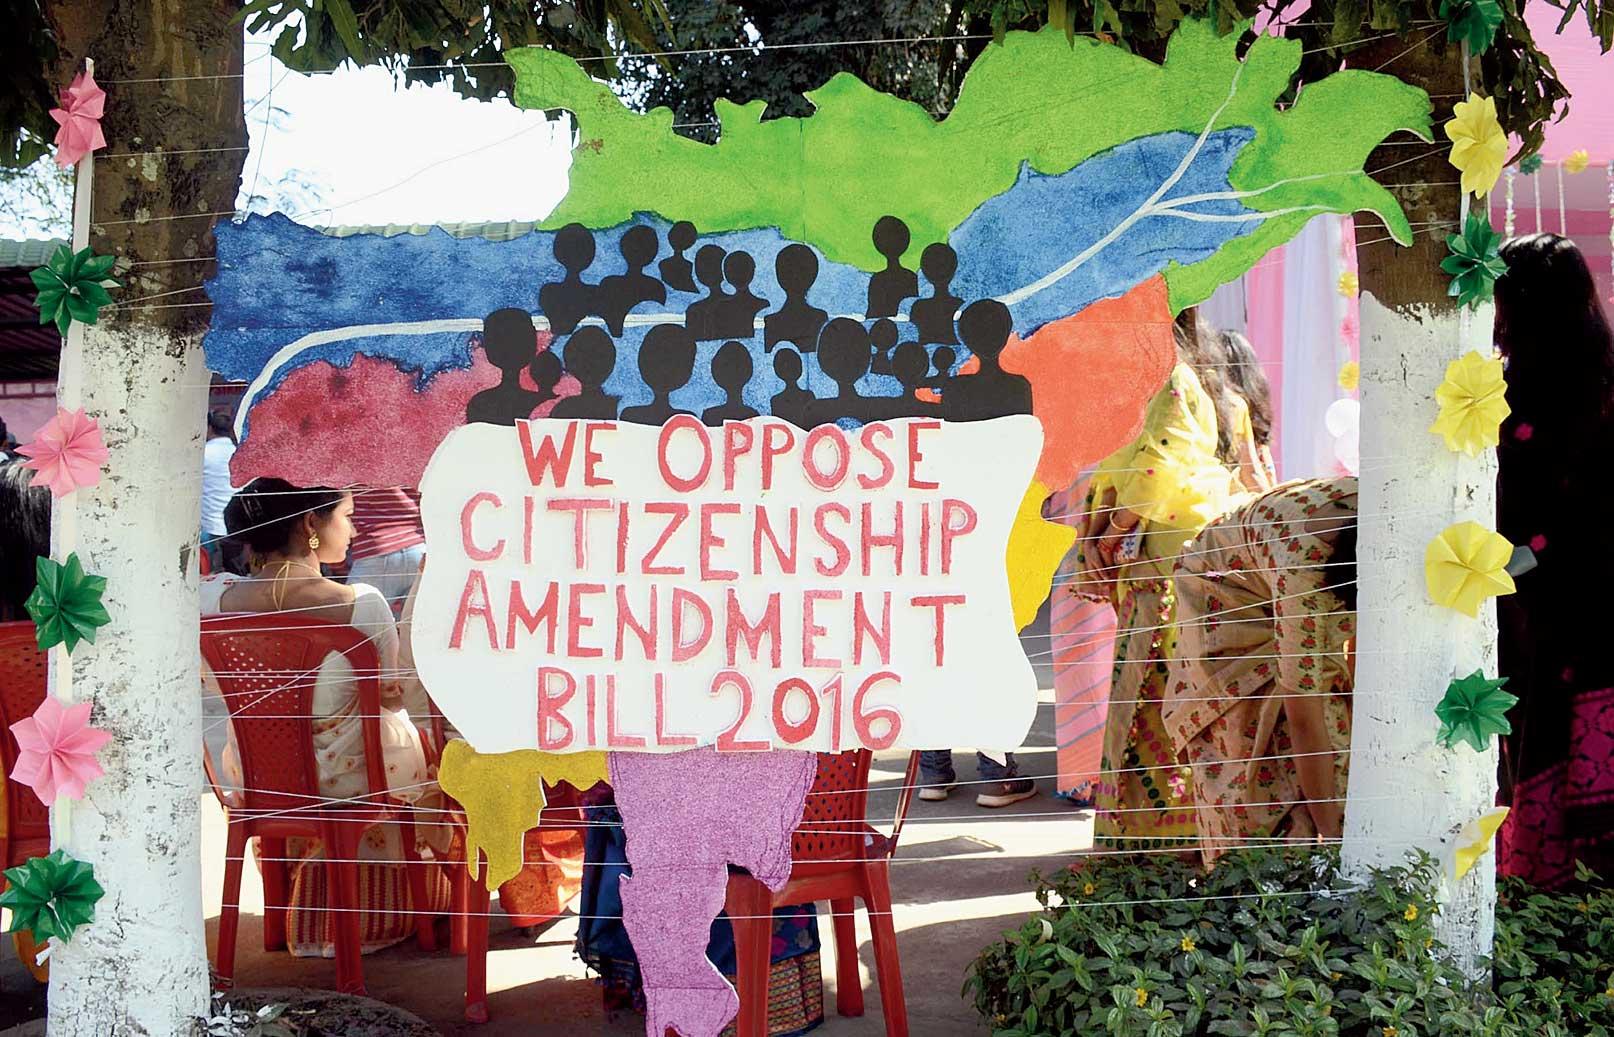 The decoration at the Saraswati Puja celebration at Cotton University in Guwahati on Sunday opposing the citizenship bill.